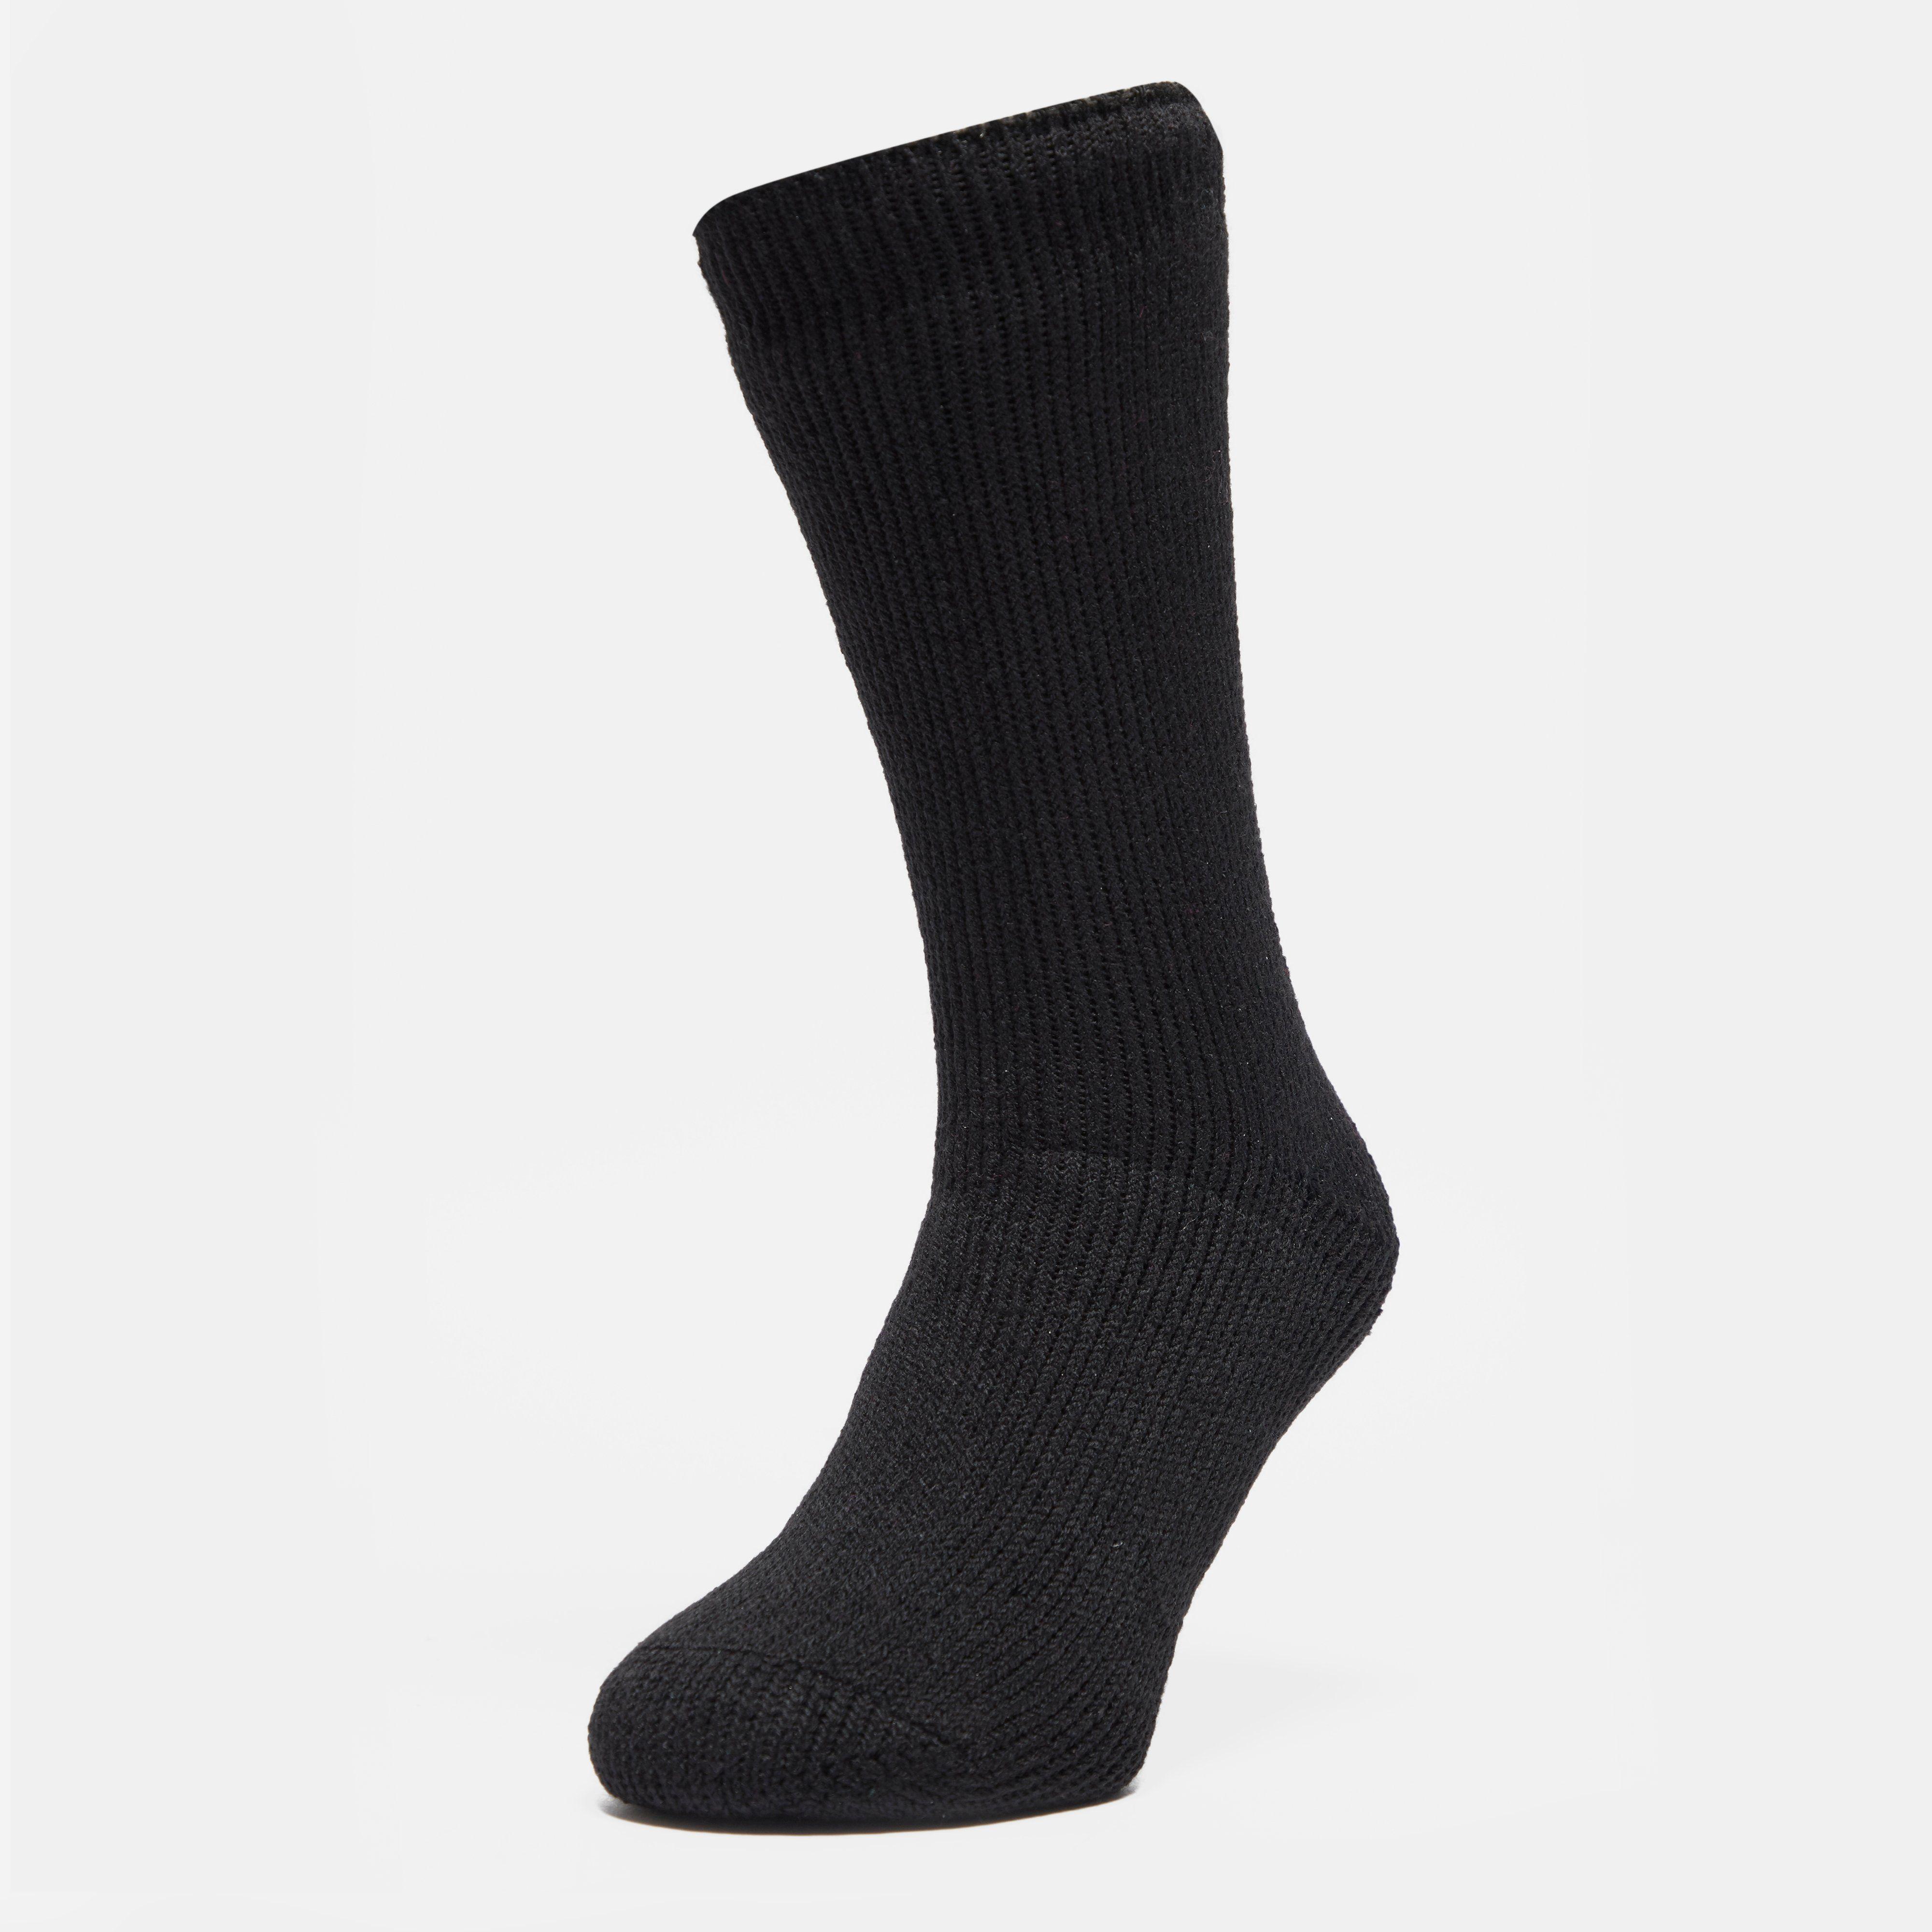 HEAT HOLDERS Women's Original Thermal Socks